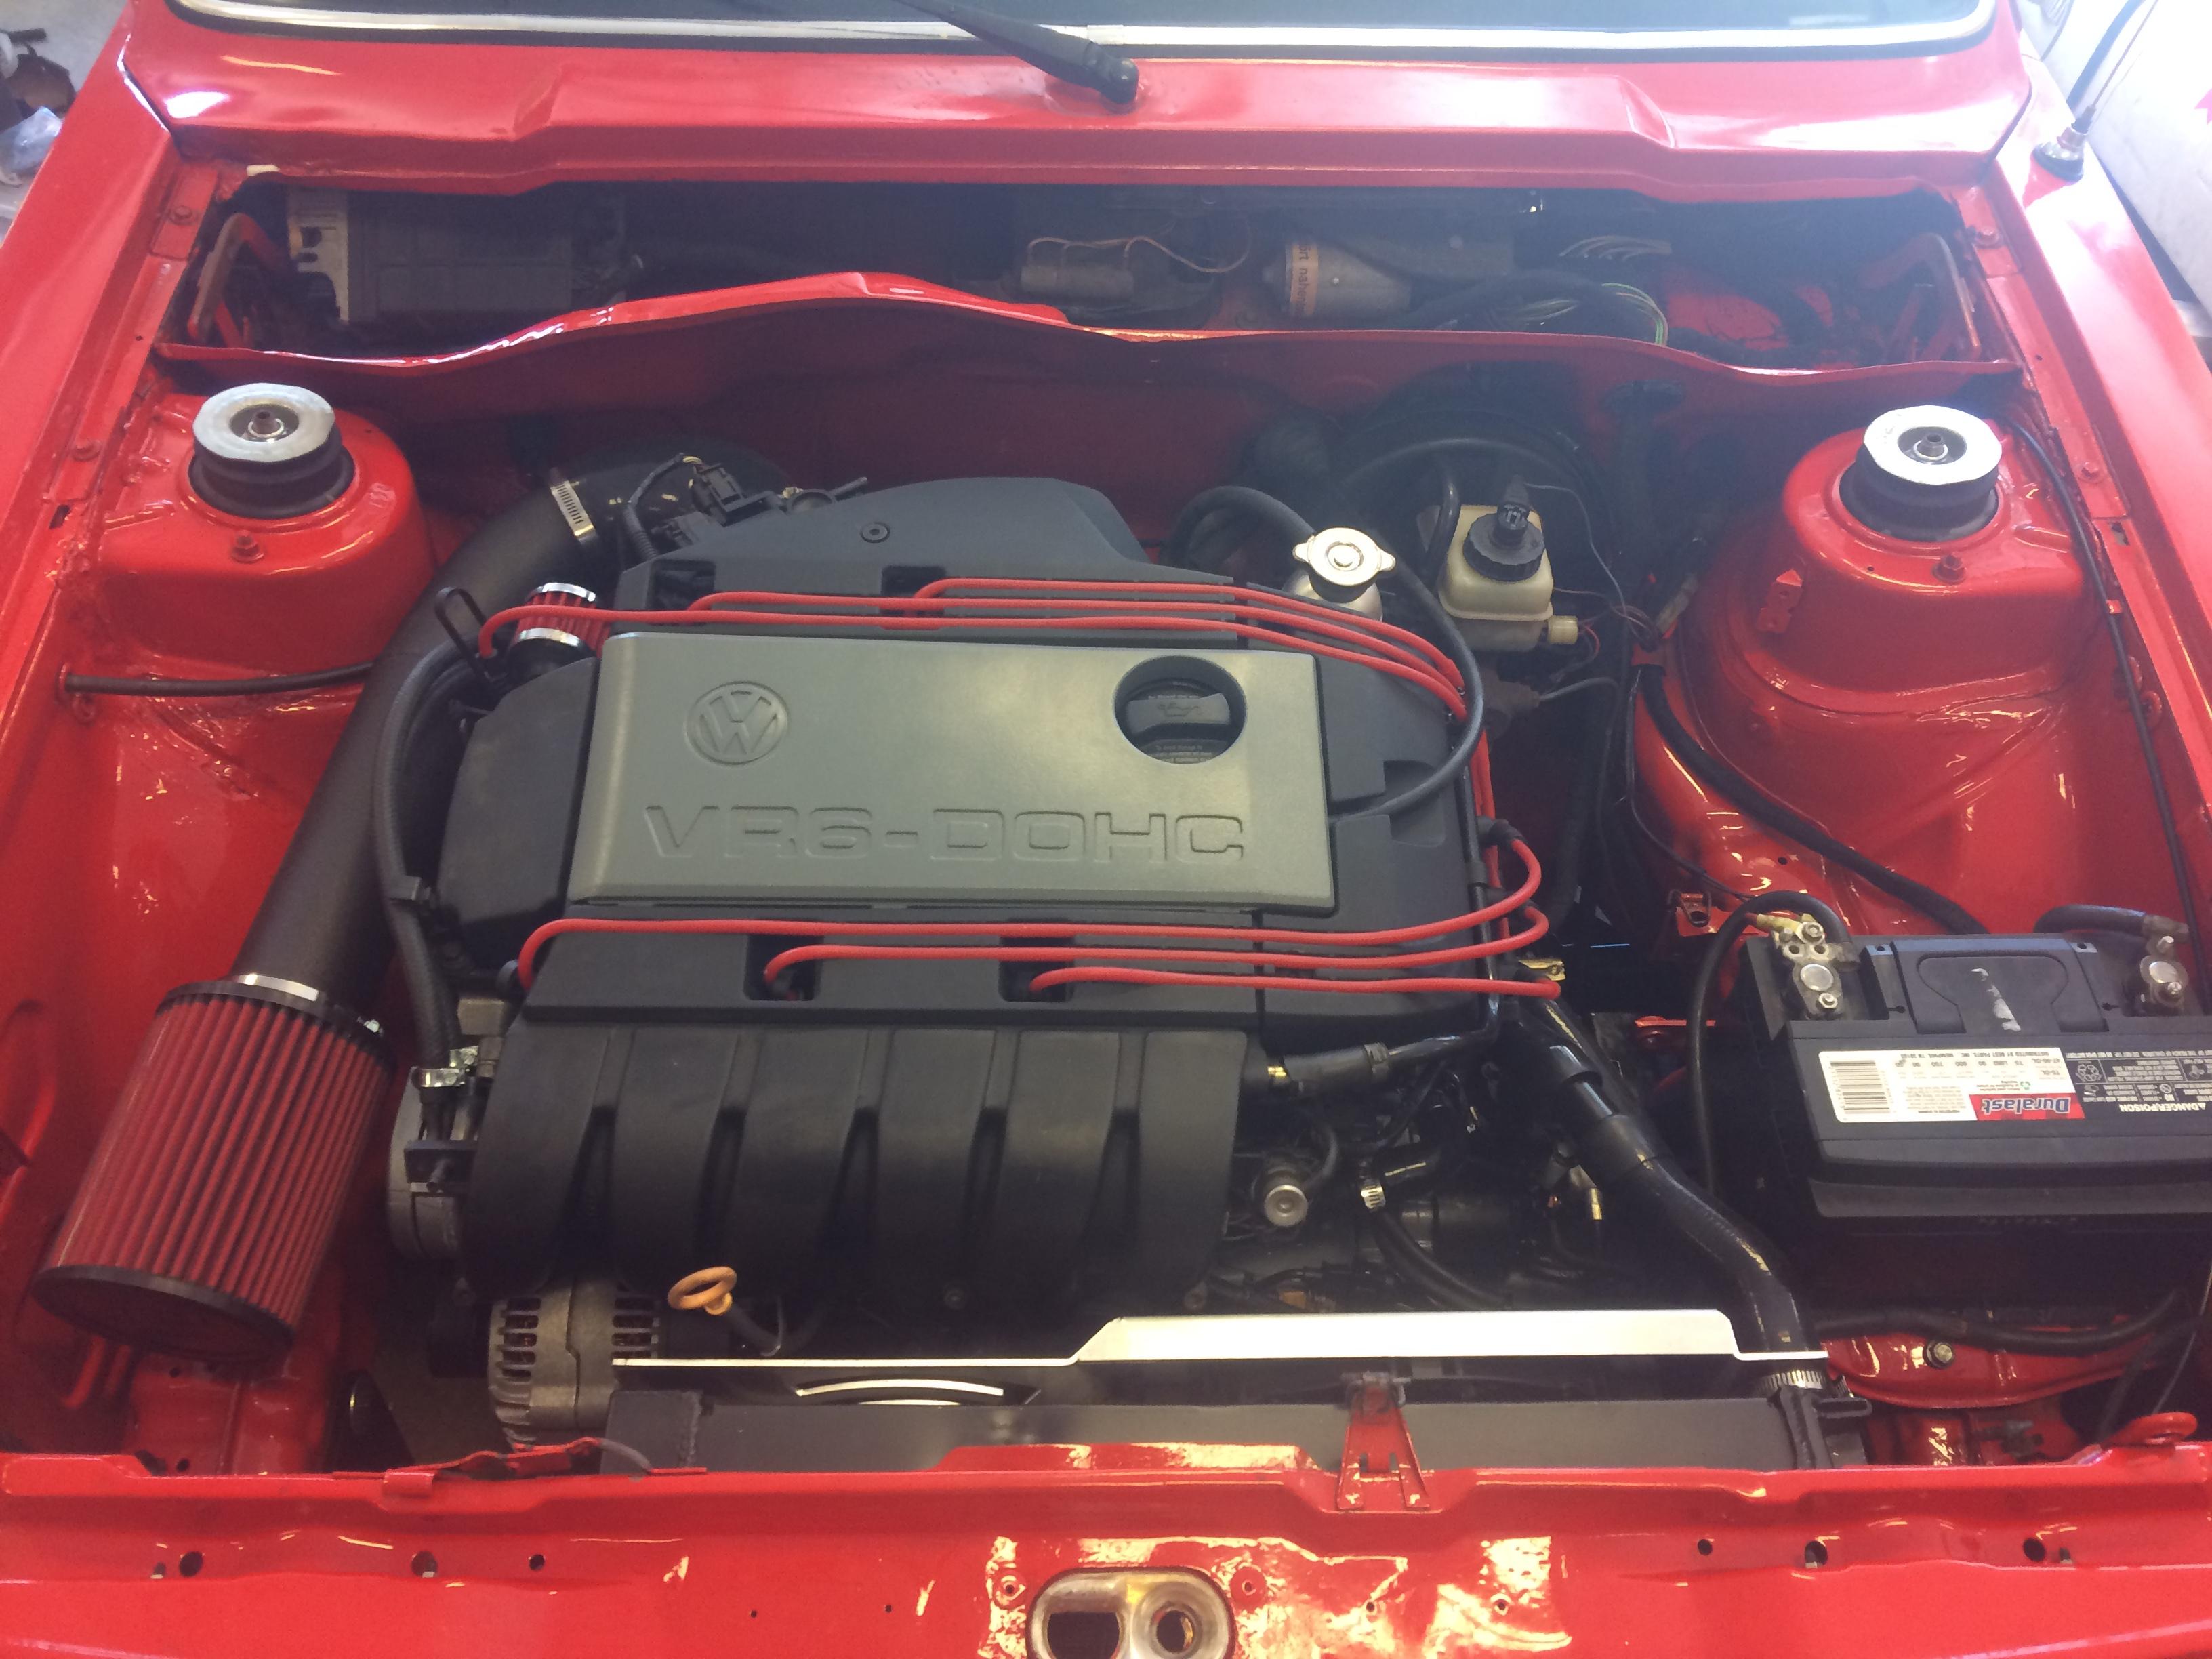 Mk1 Mk2 & MK3 VR6 Hidden MAF Intake Pipe and Filter